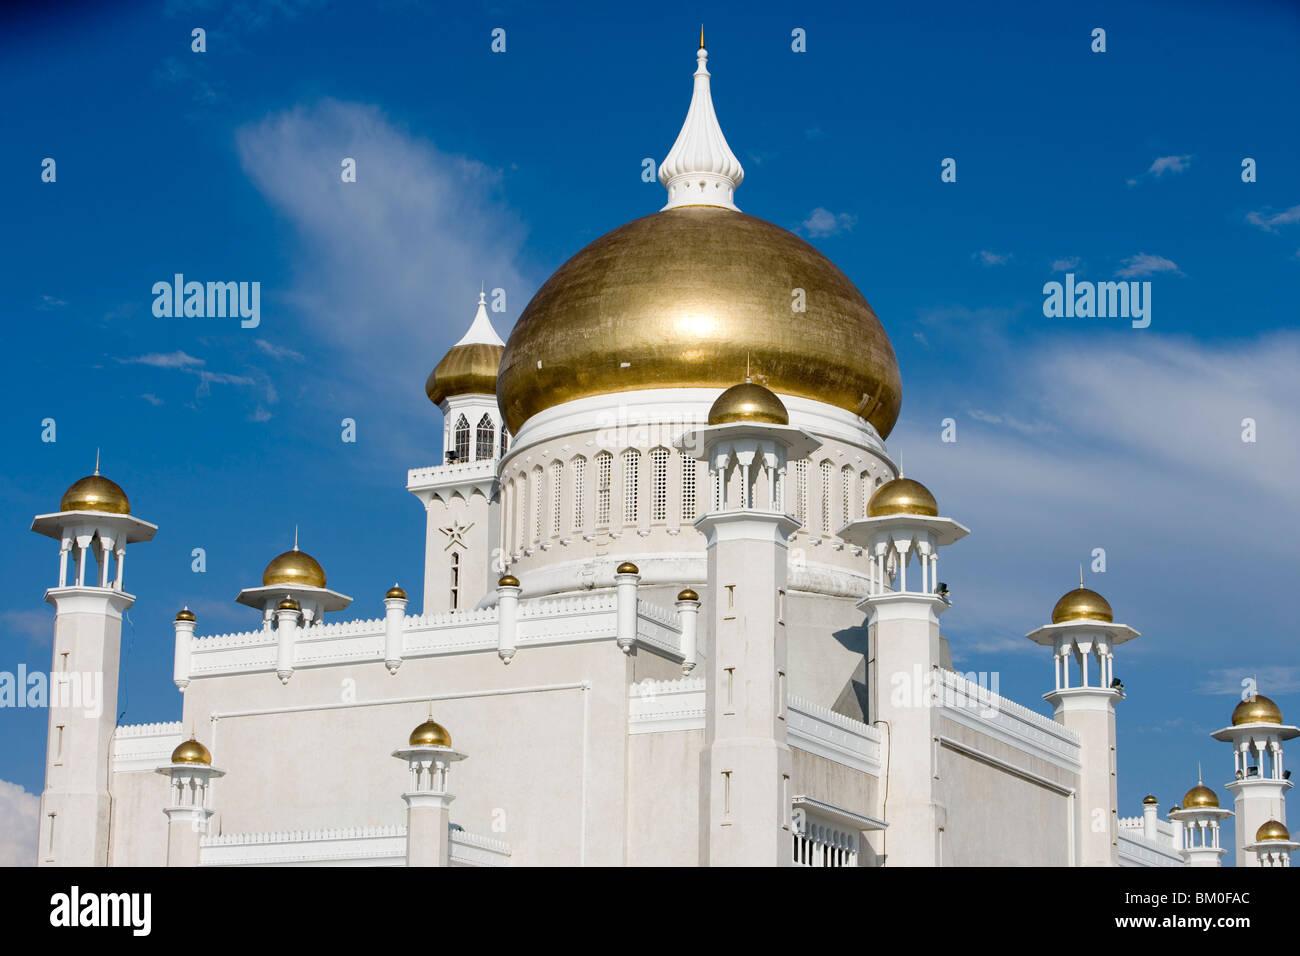 Omar Ali Saifuddien Mosque, Bandar Seri Begawan, Brunei Darussalam, Asia - Stock Image